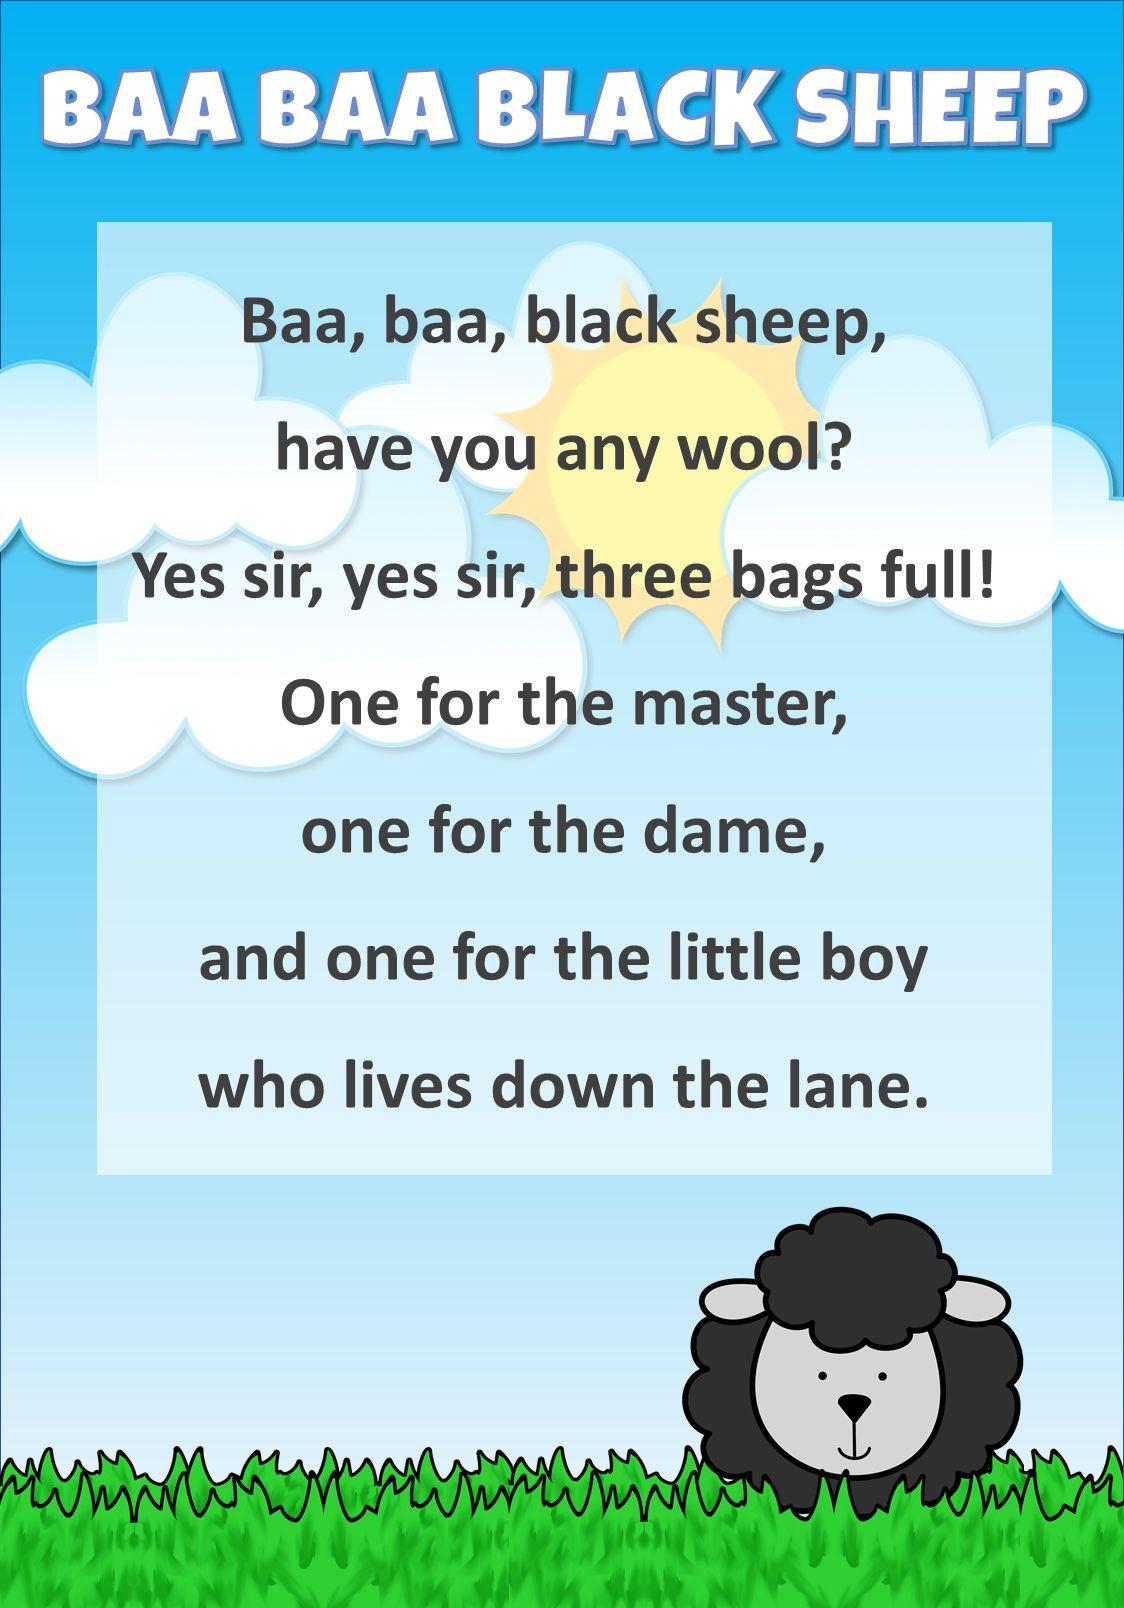 Baa Baa Black Sheep Baa Baa Black Sheep Black Sheep Nursery Rhymes Lyrics